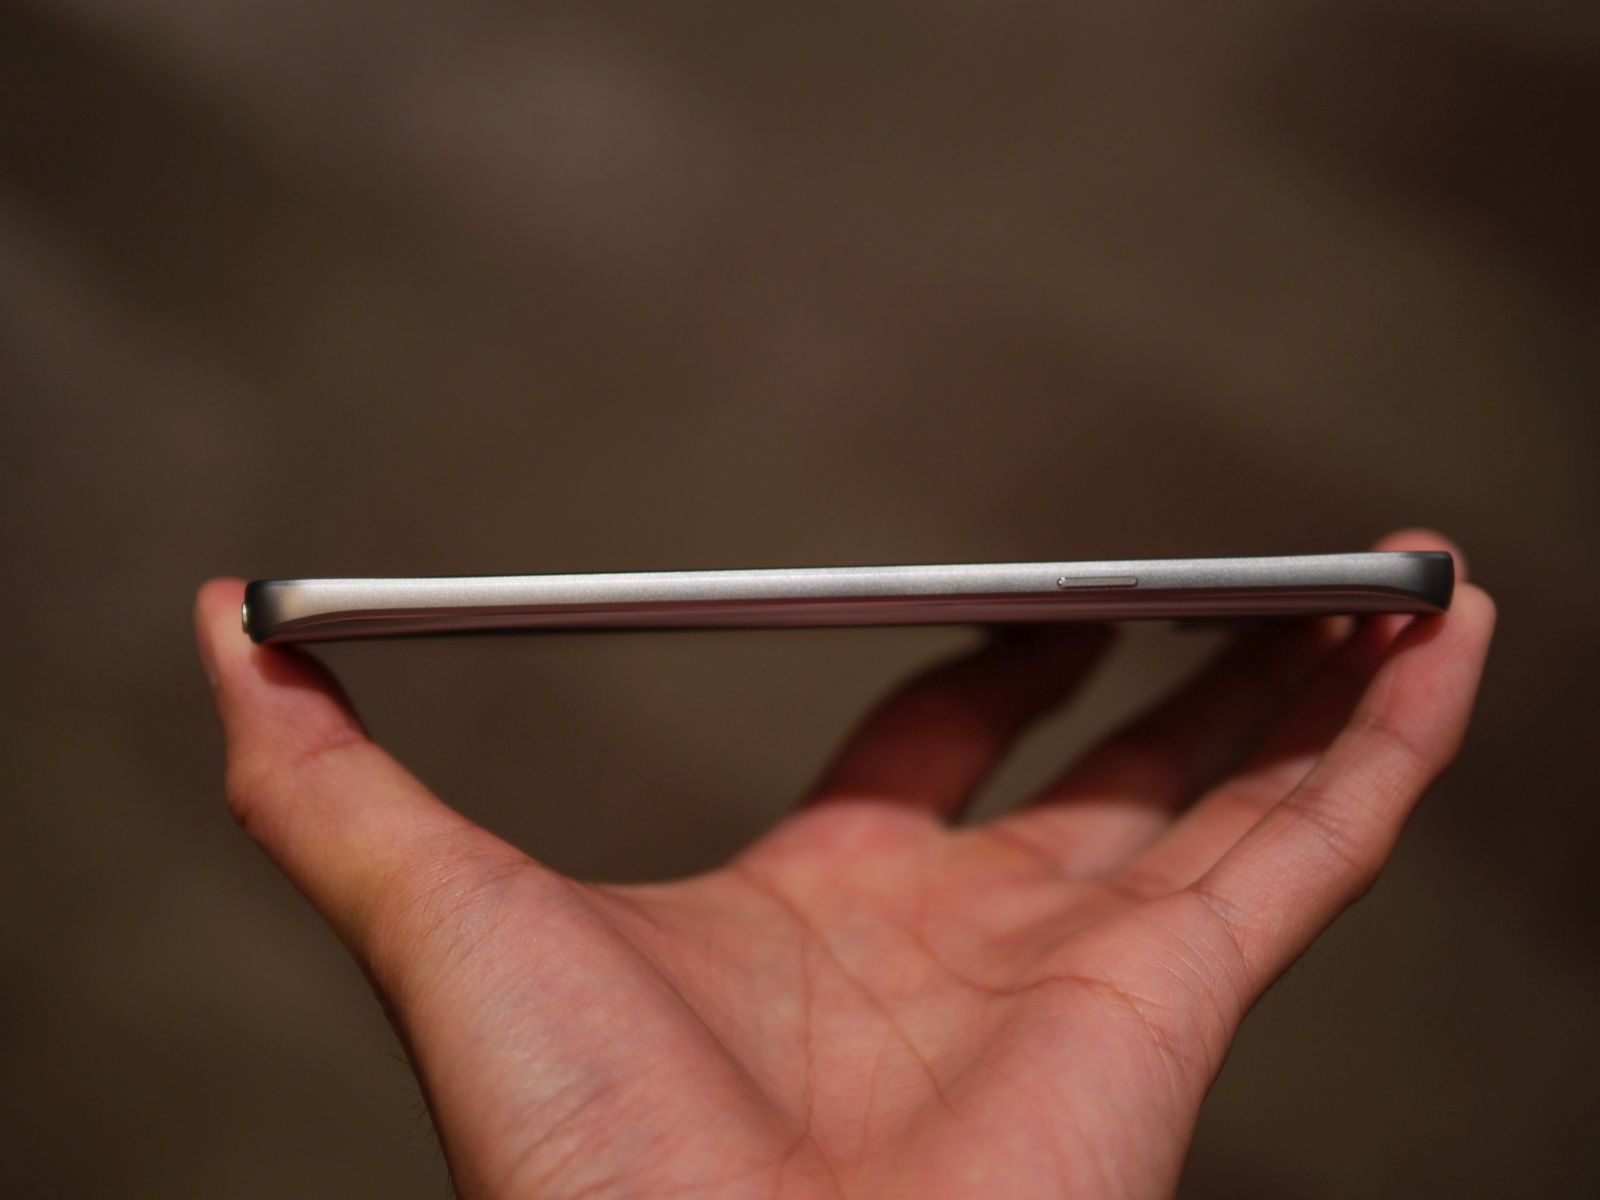 Samsung Galaxy S6 edge Plus 10